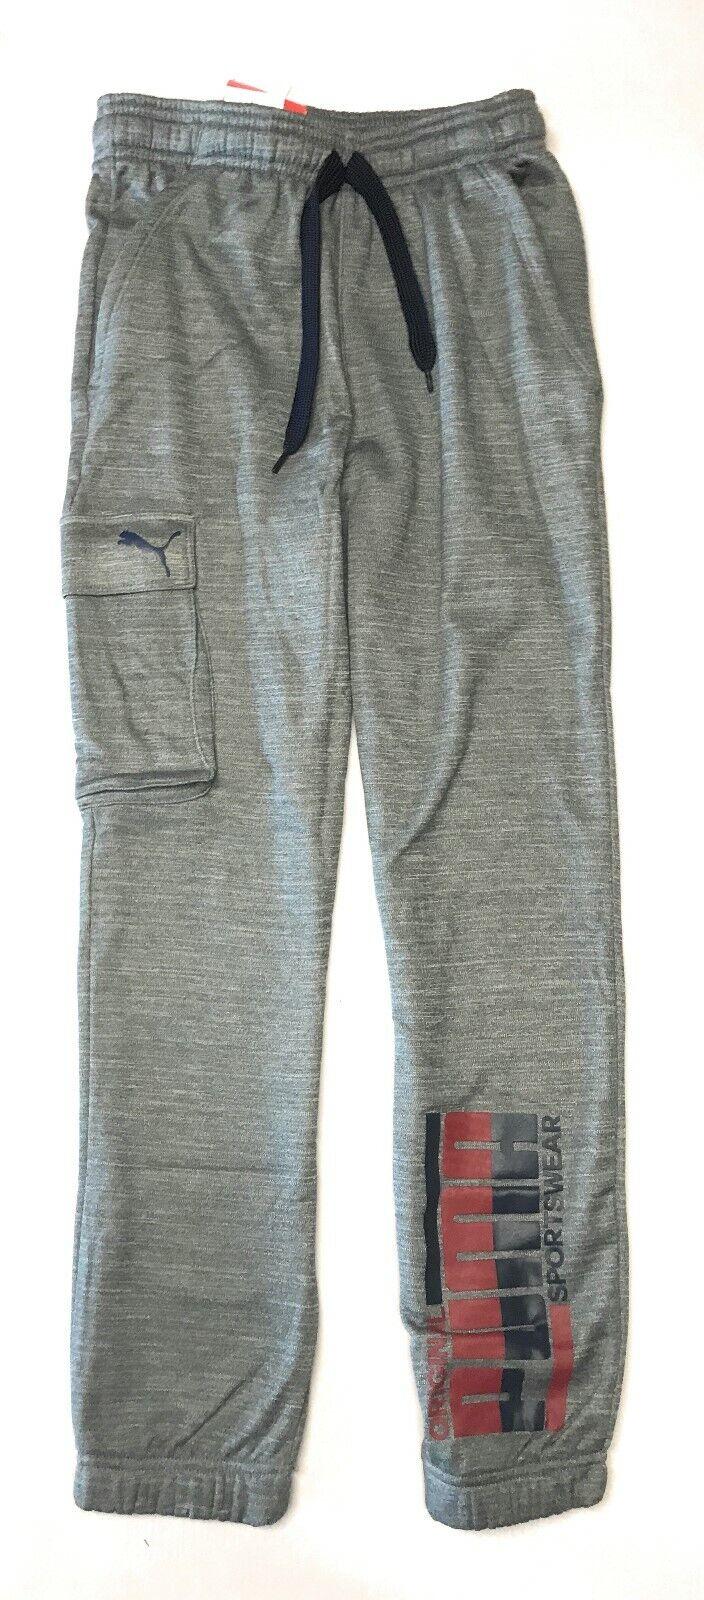 PUMA Big Boys' Cargo Fleece Pants